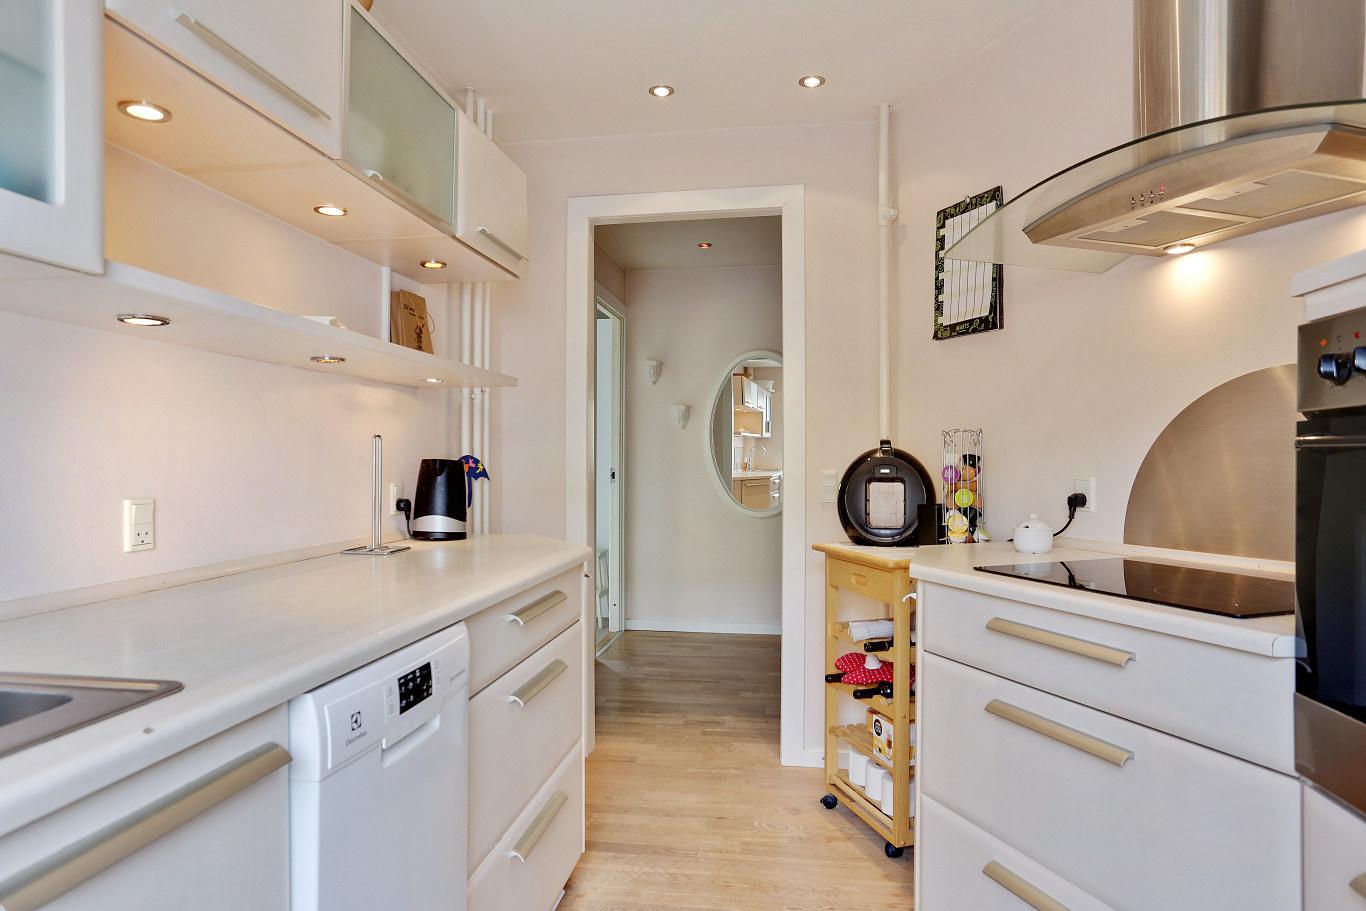 Comprar ofertas platos de ducha muebles sofas spain for Diseno de interiores para espacios pequenos